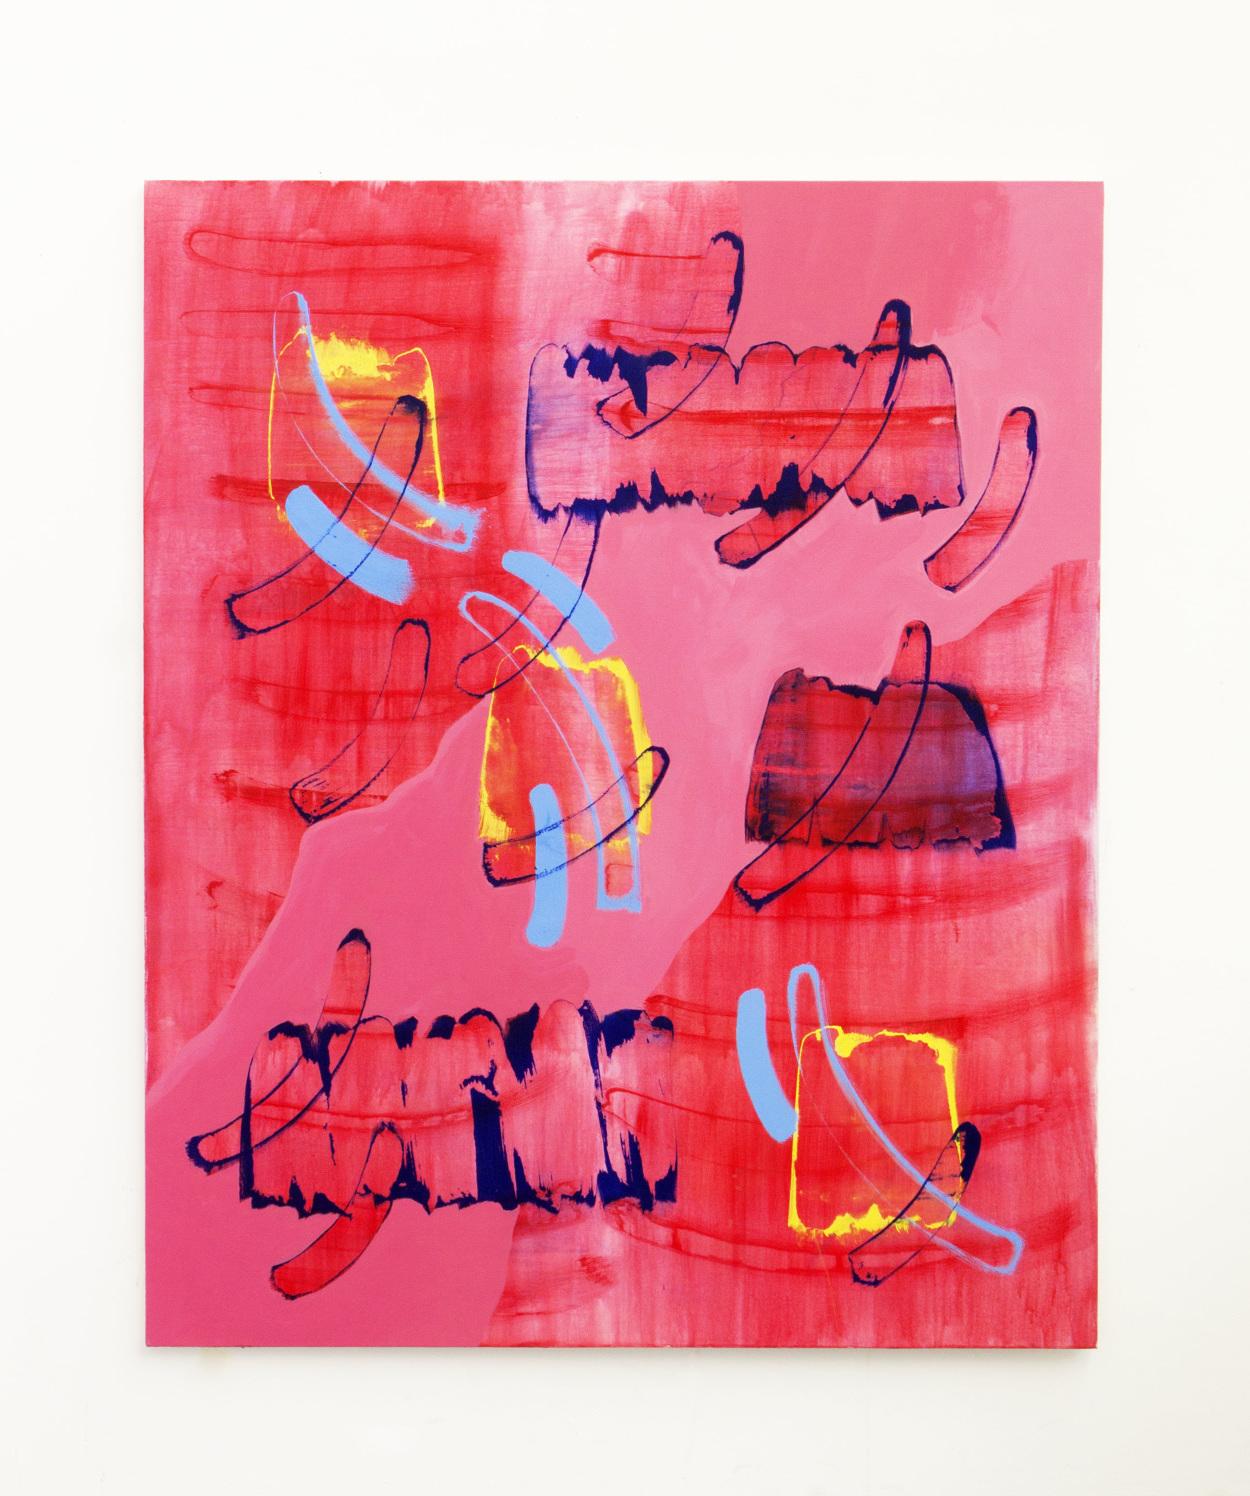 Goia Mujalli, Phonetics, Acrylic on Canvas, 2016